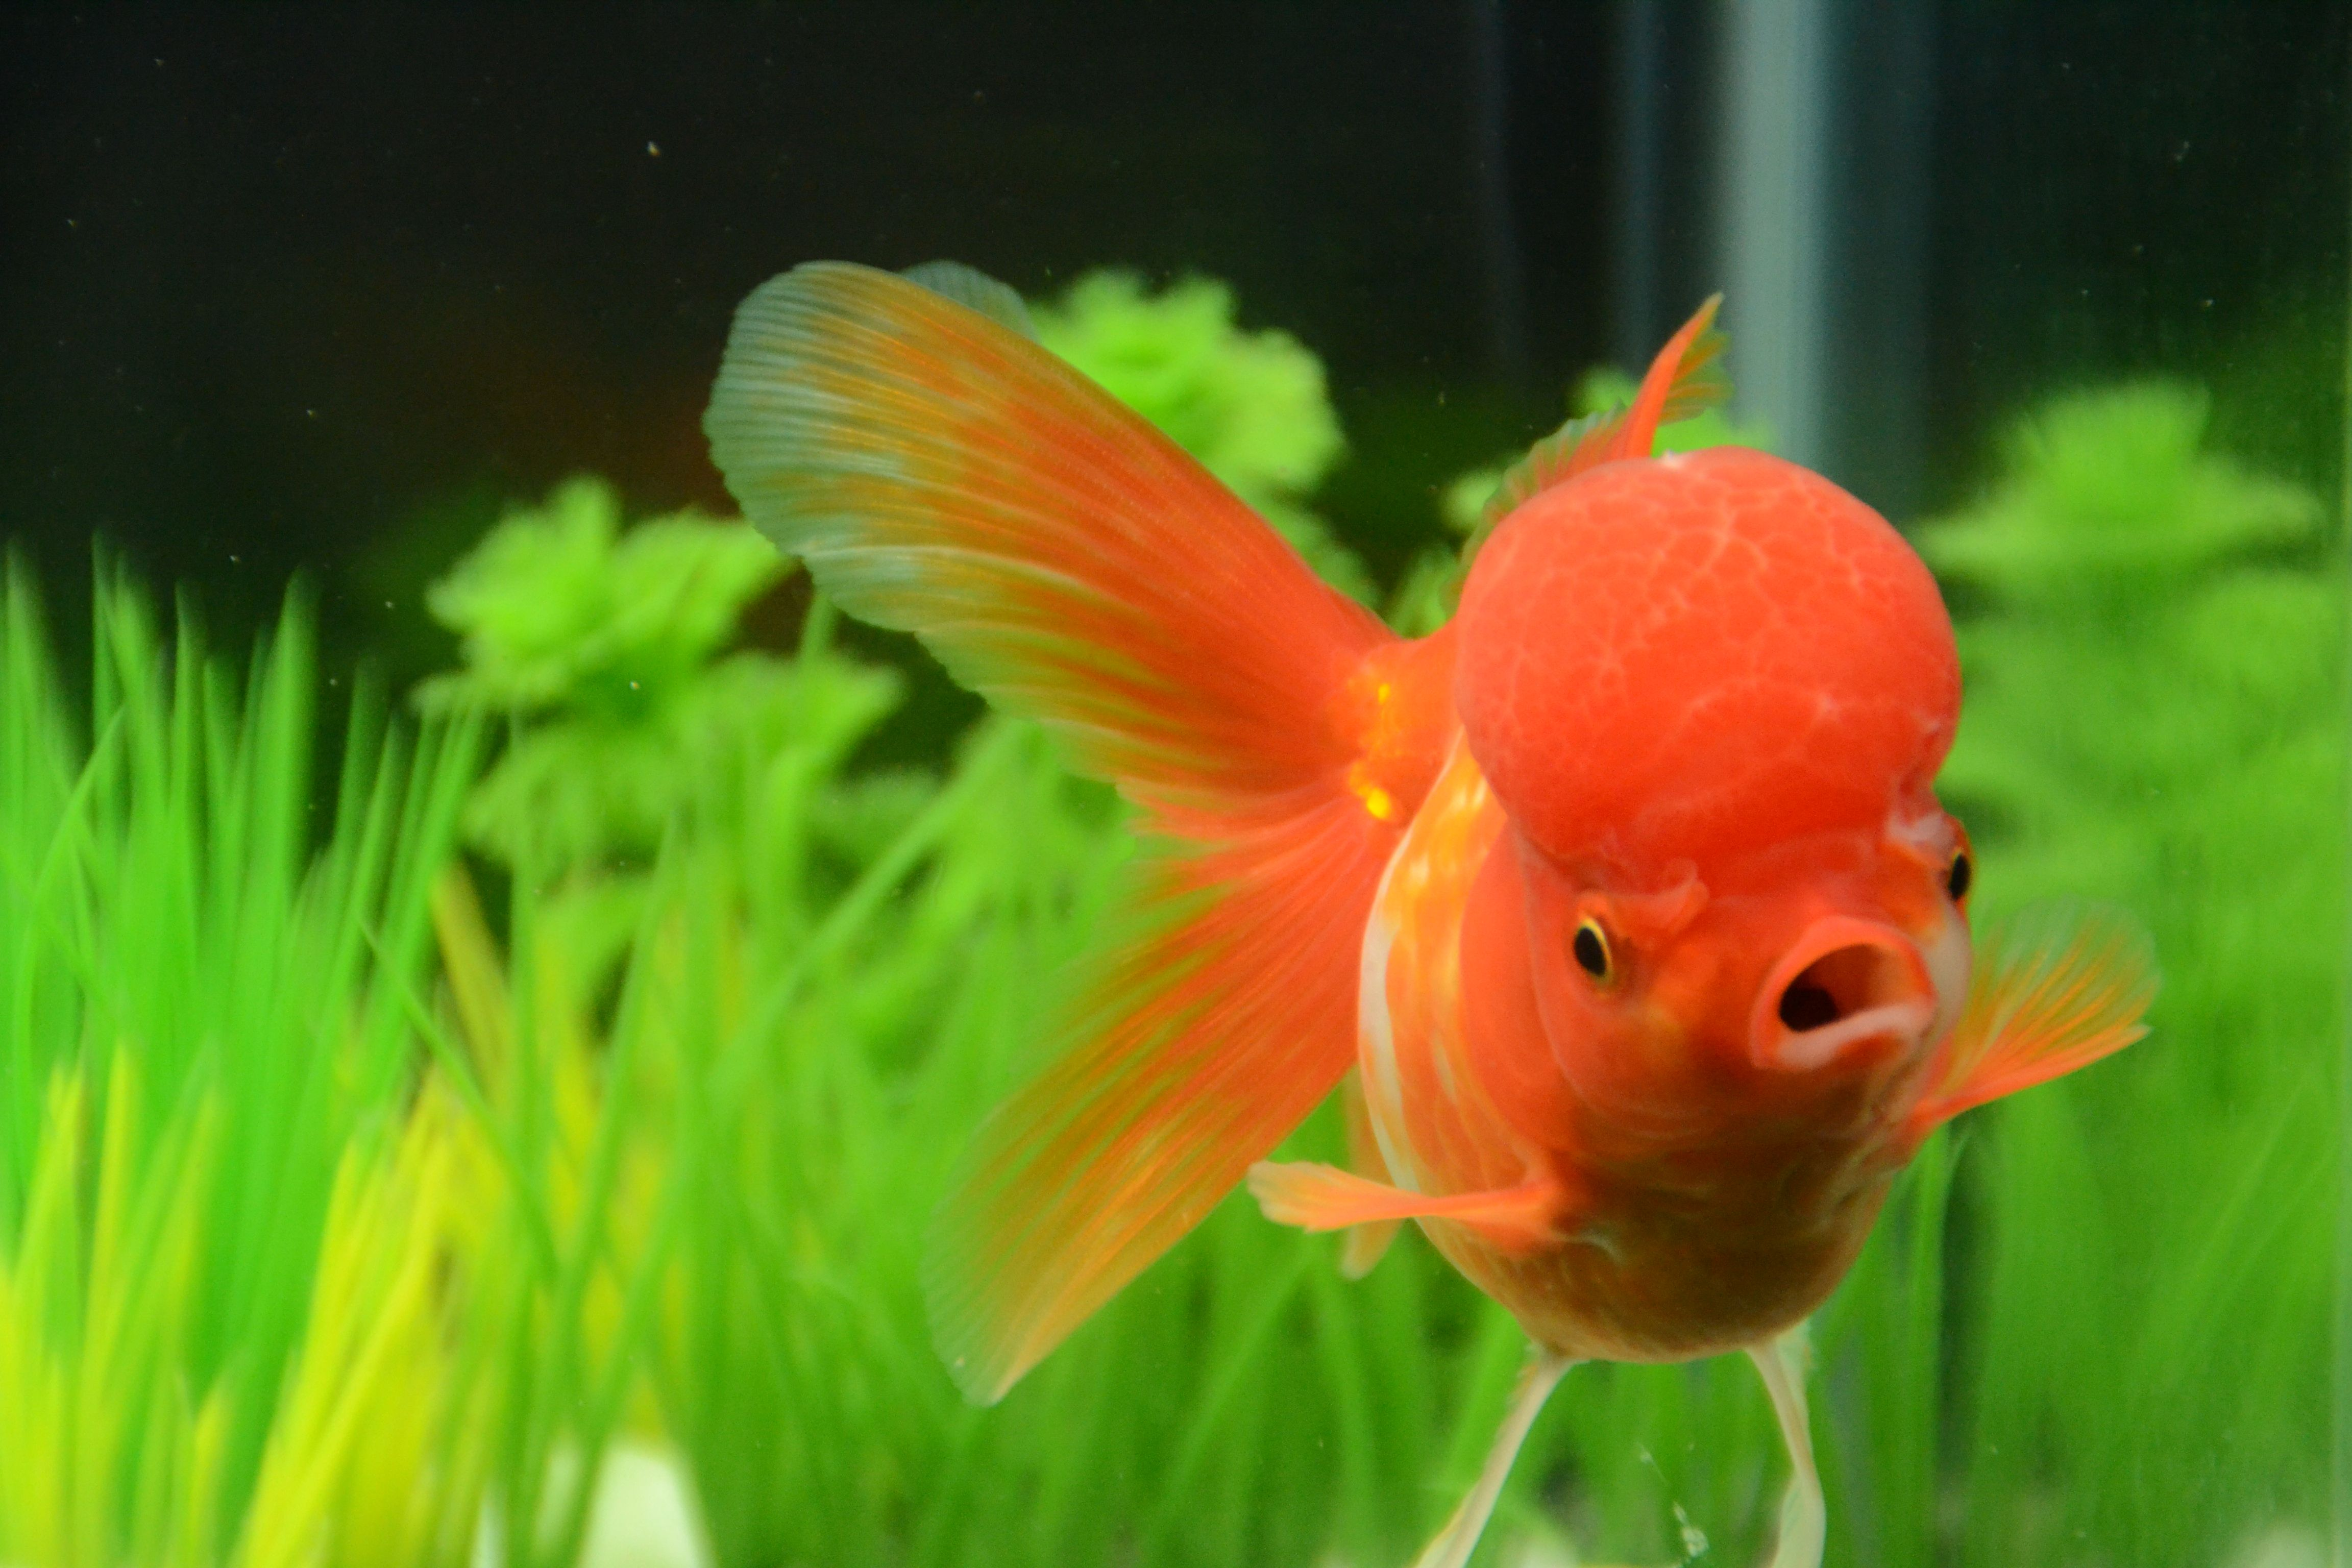 Red And White Oranda Goldfish Big Wen Buygoldfishonline Com Goldfish Oranda Goldfish Buy Goldfish